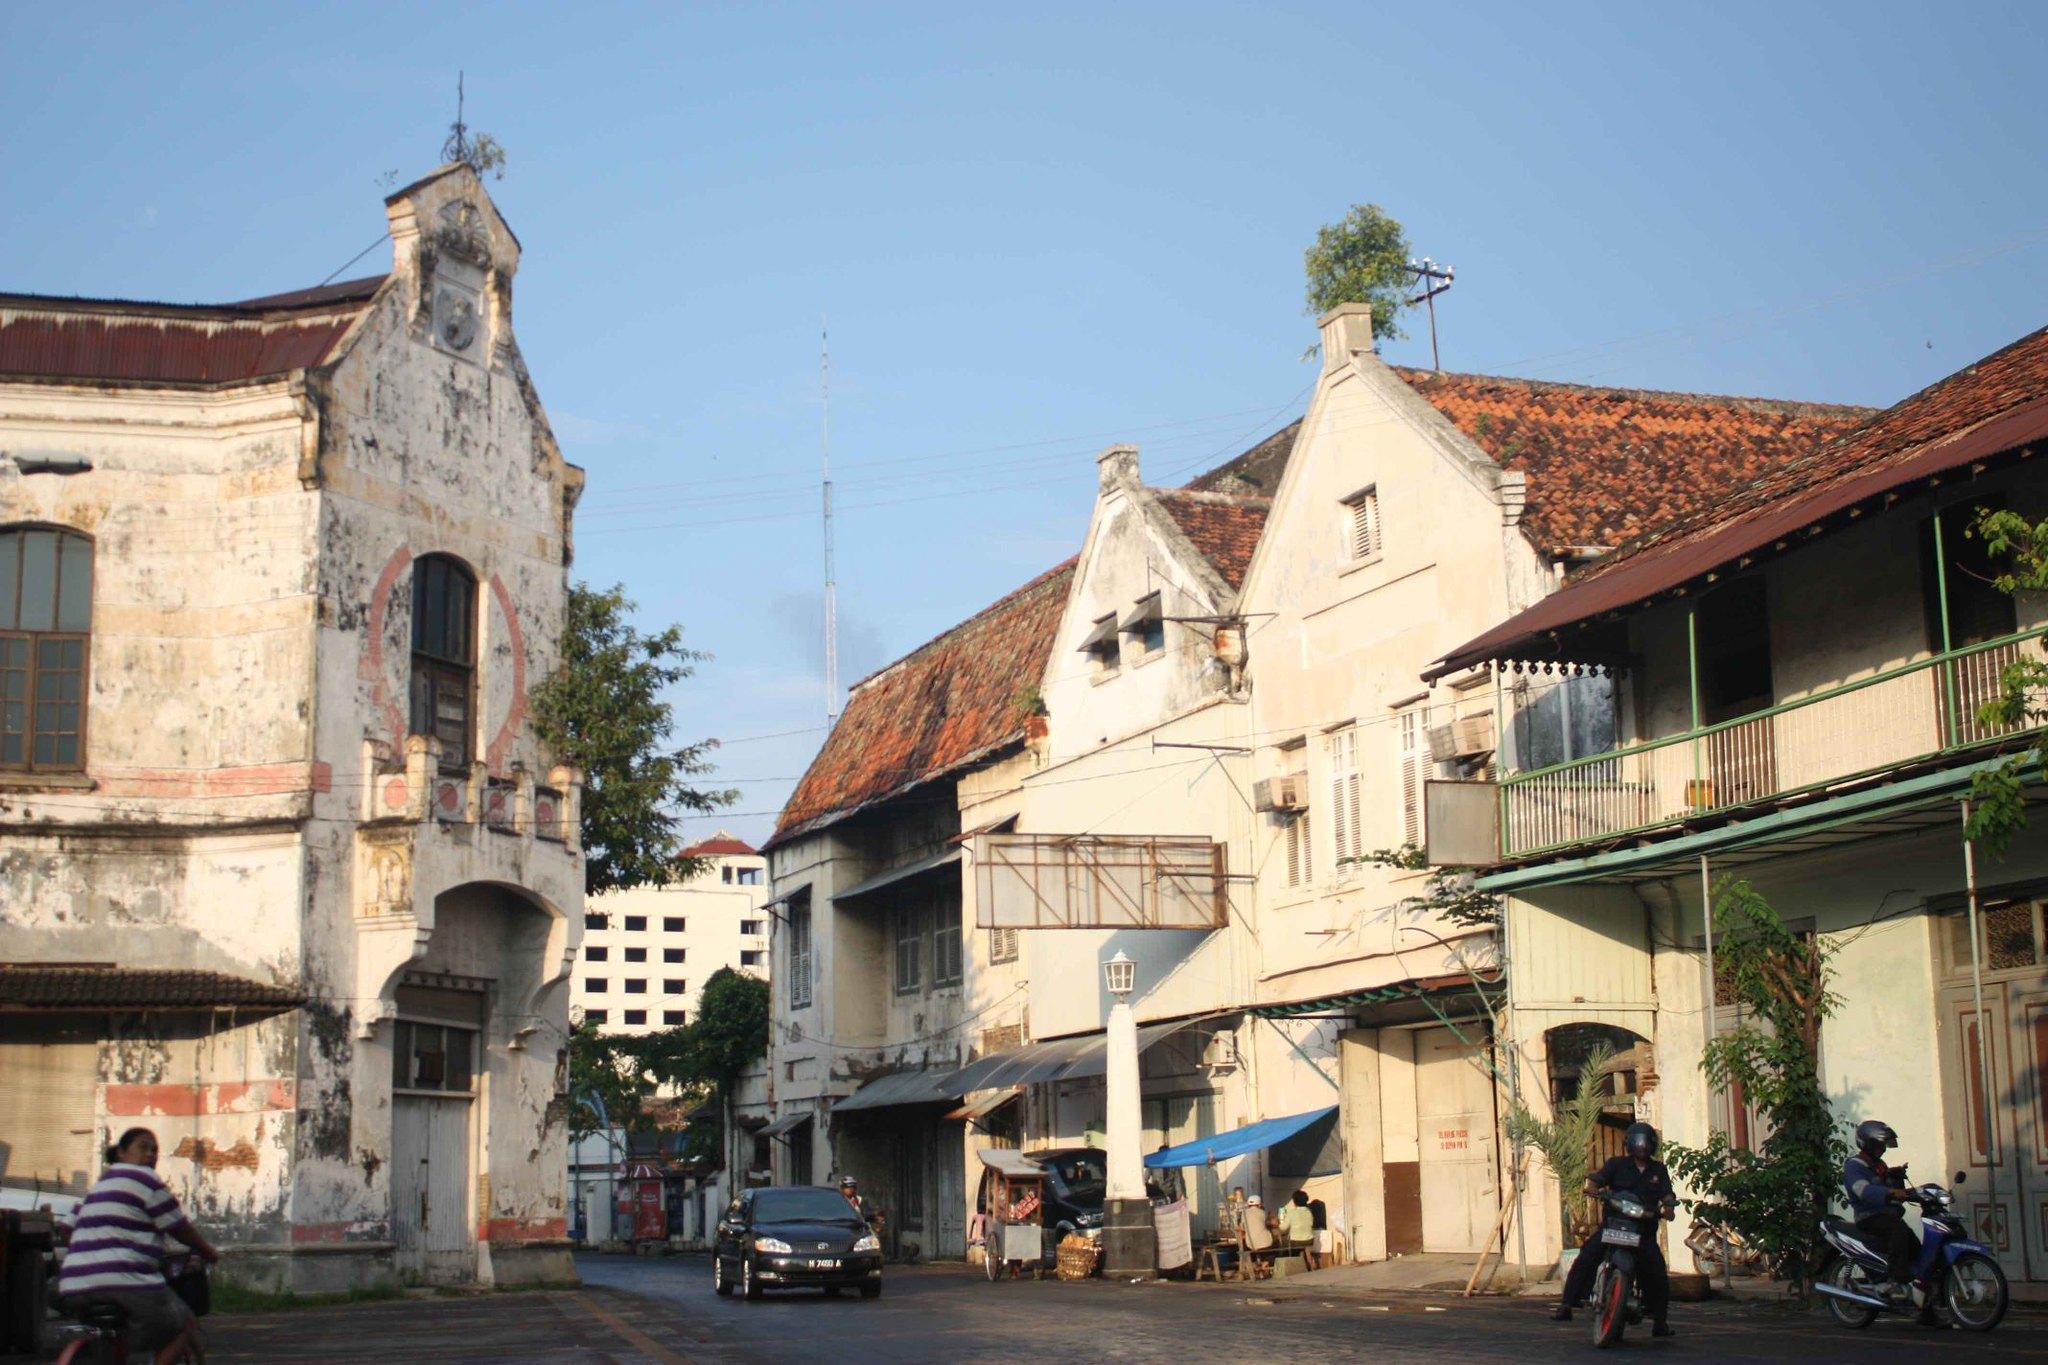 Bangunan ikonik di Kota Lama Semarang | Foto: holamigo.id